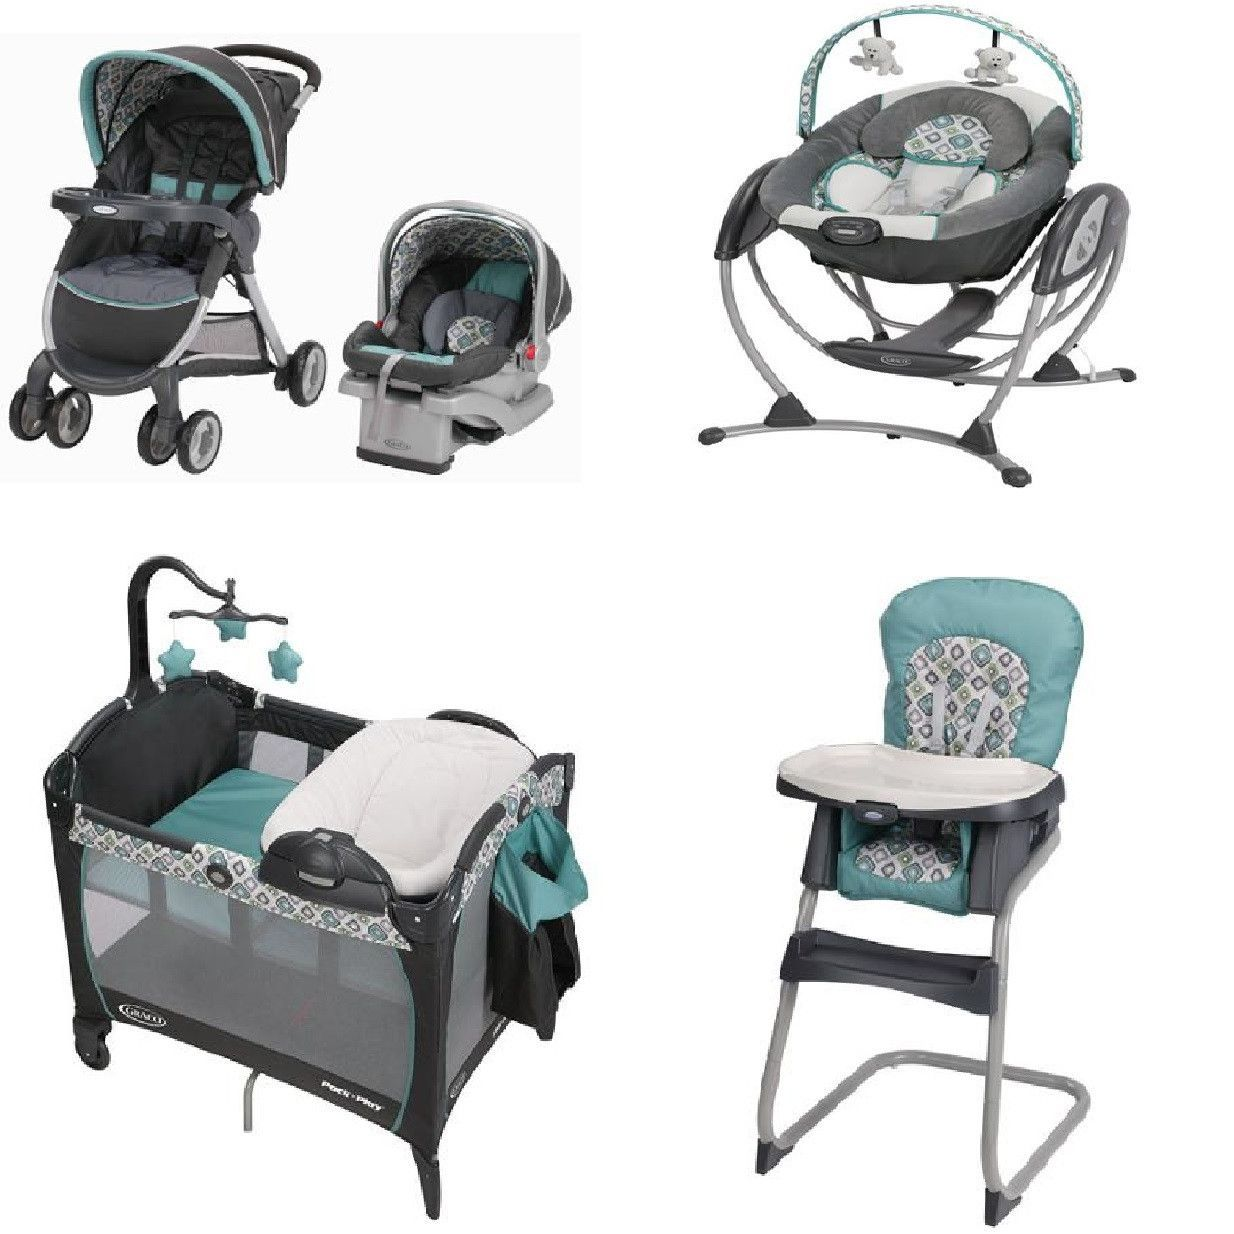 Graco Affinia Blue Complete Baby Gear Bundle, Stroller